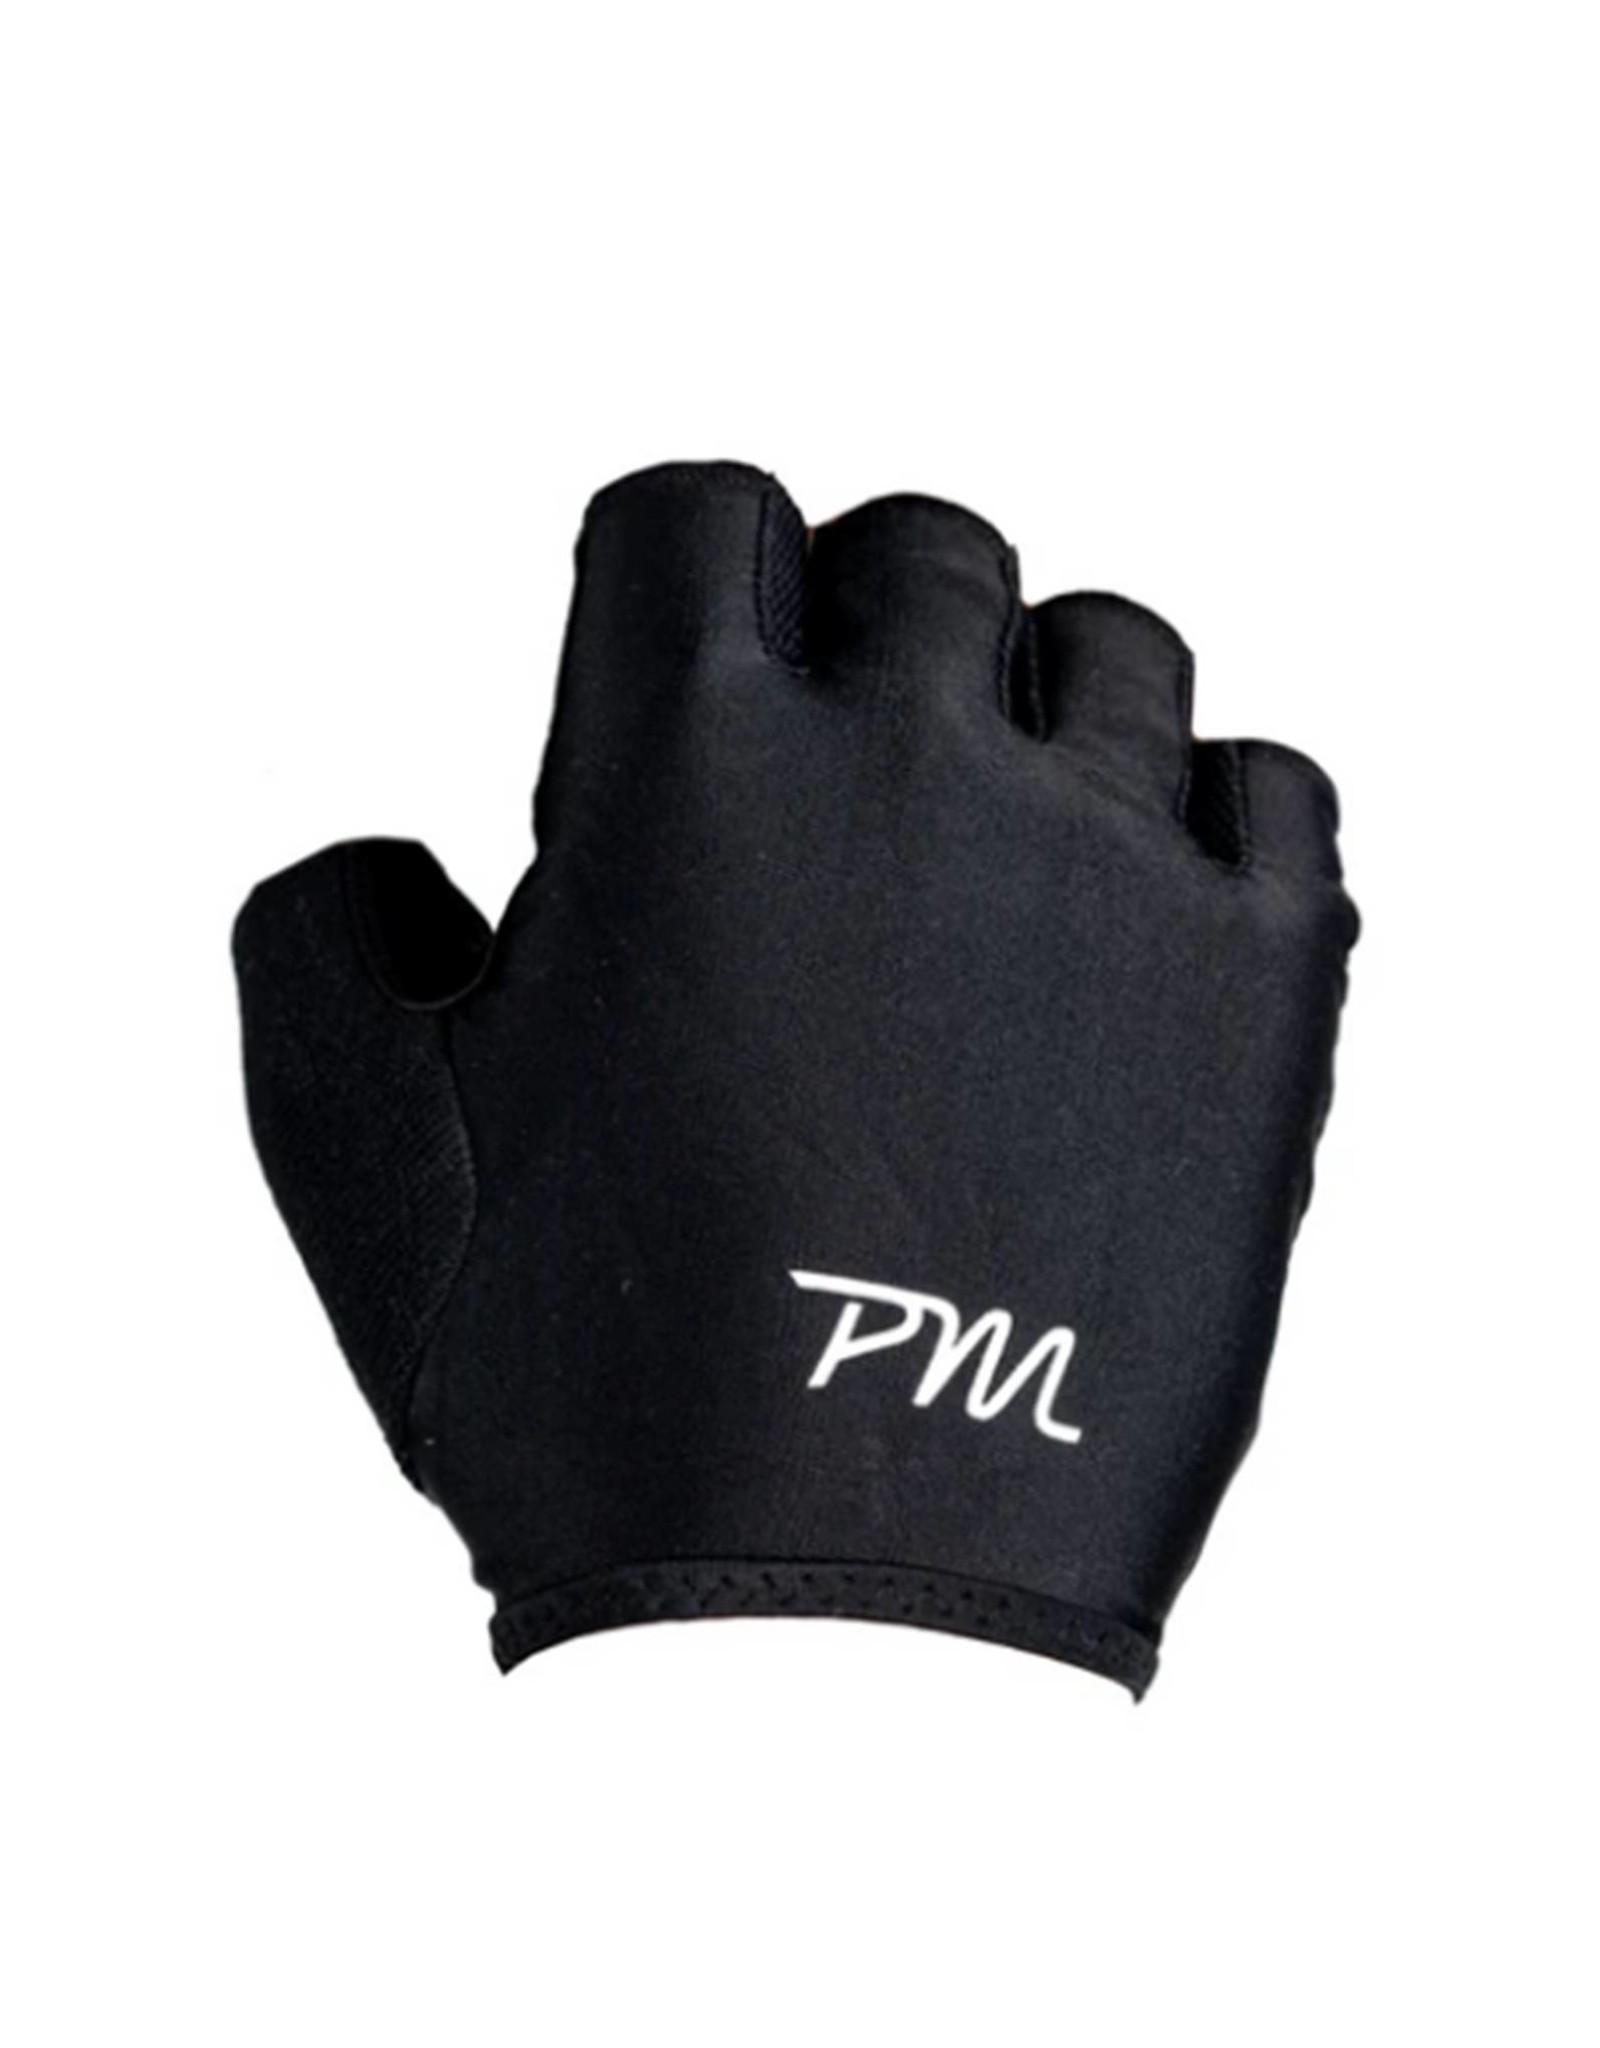 Pedal Mafia Short Finger Cycling Gloves Black/White